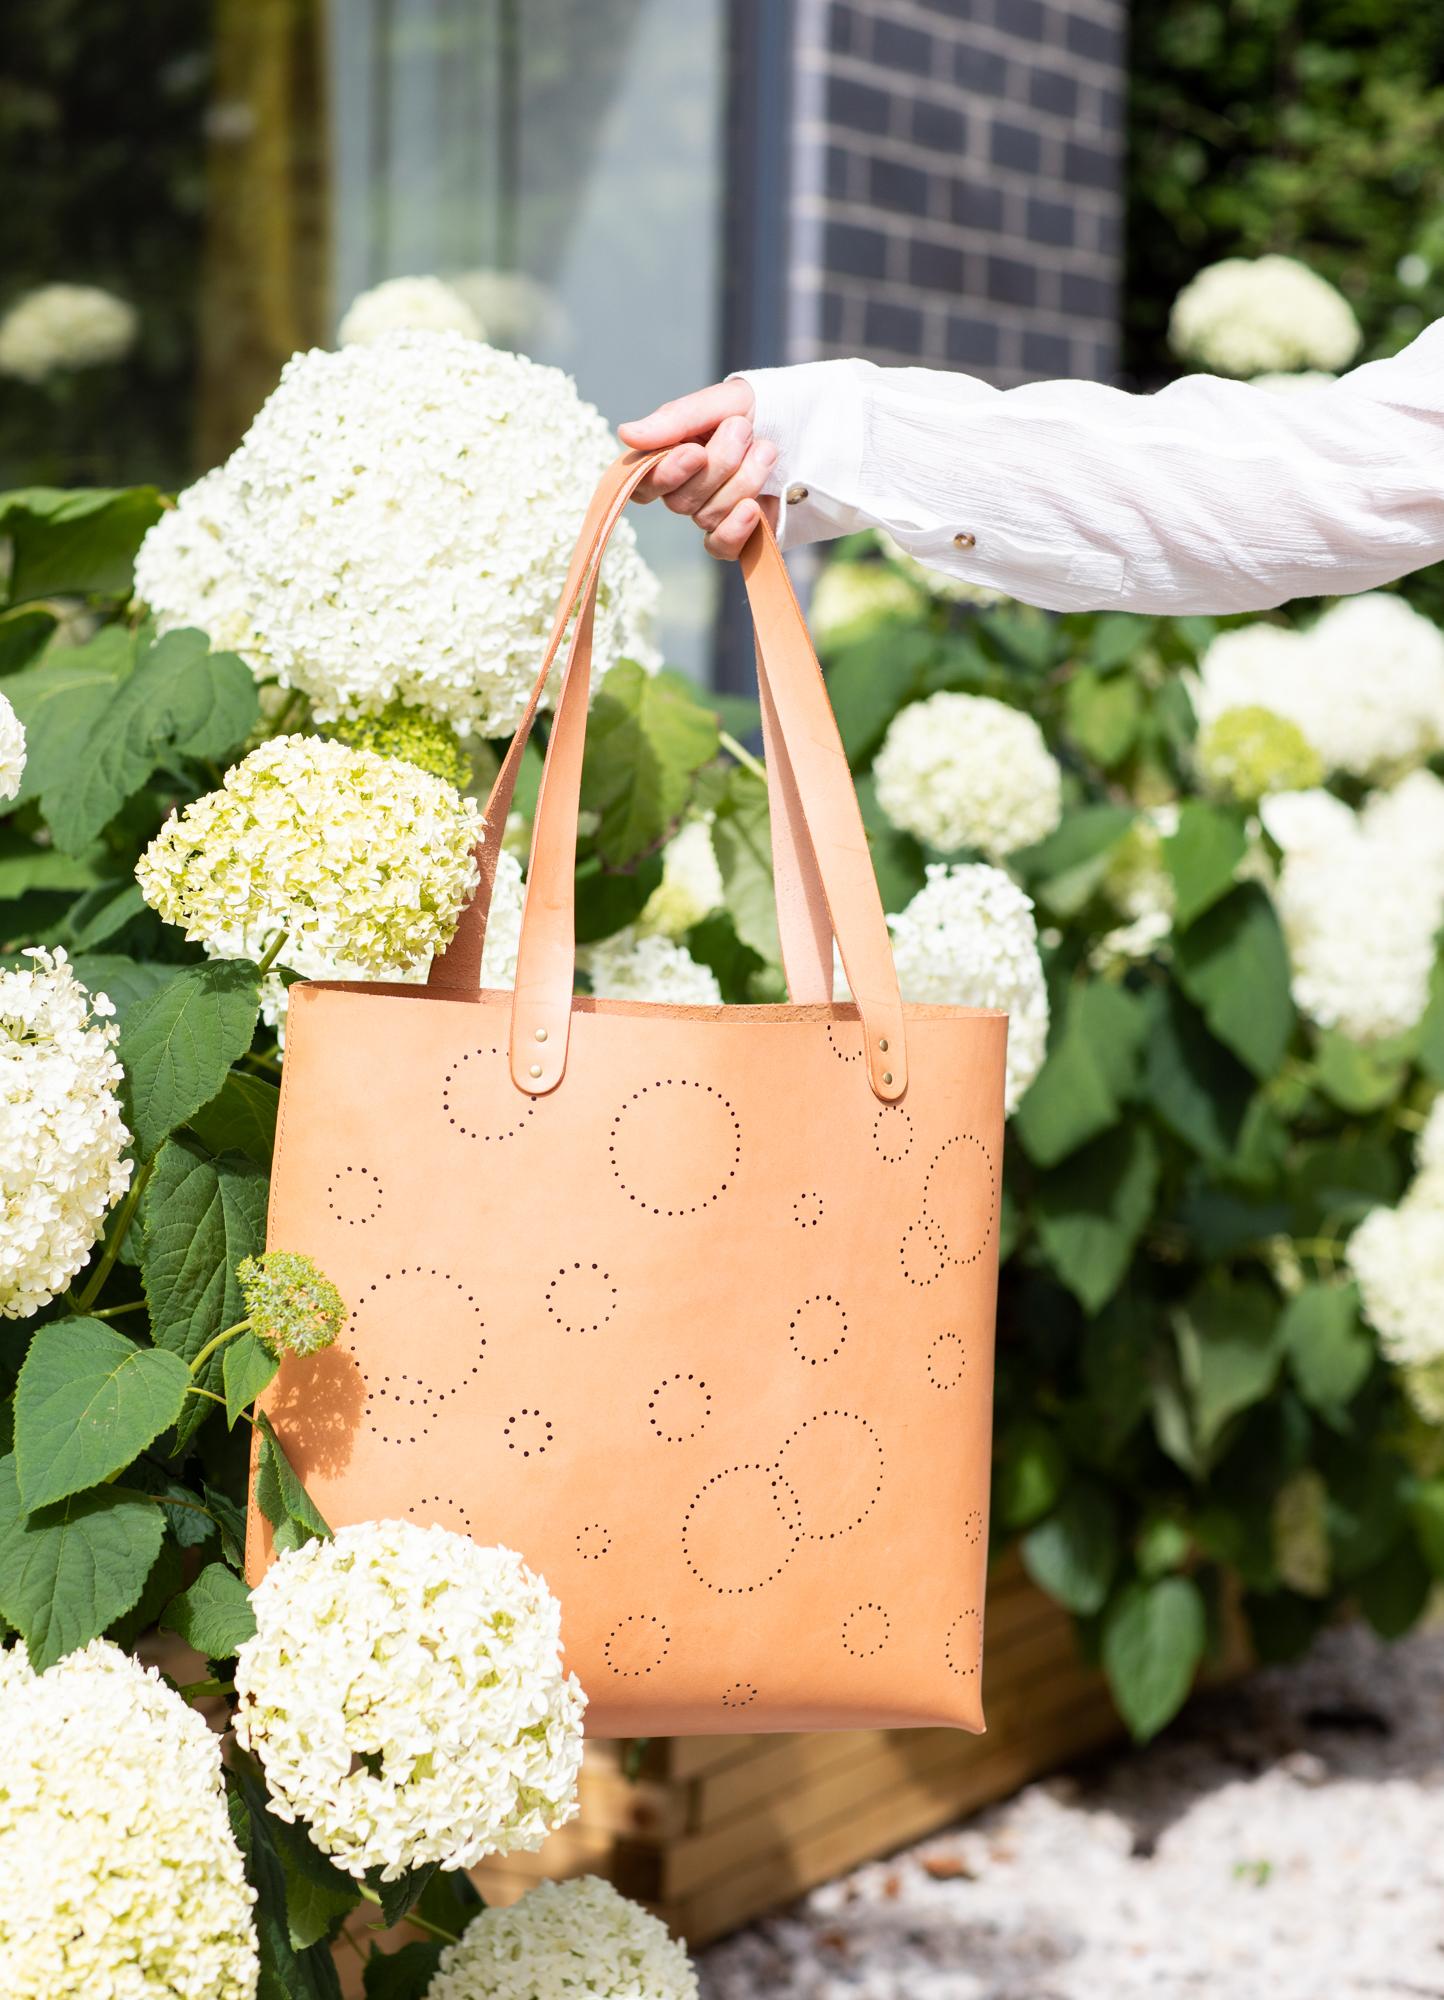 Handbags product photography